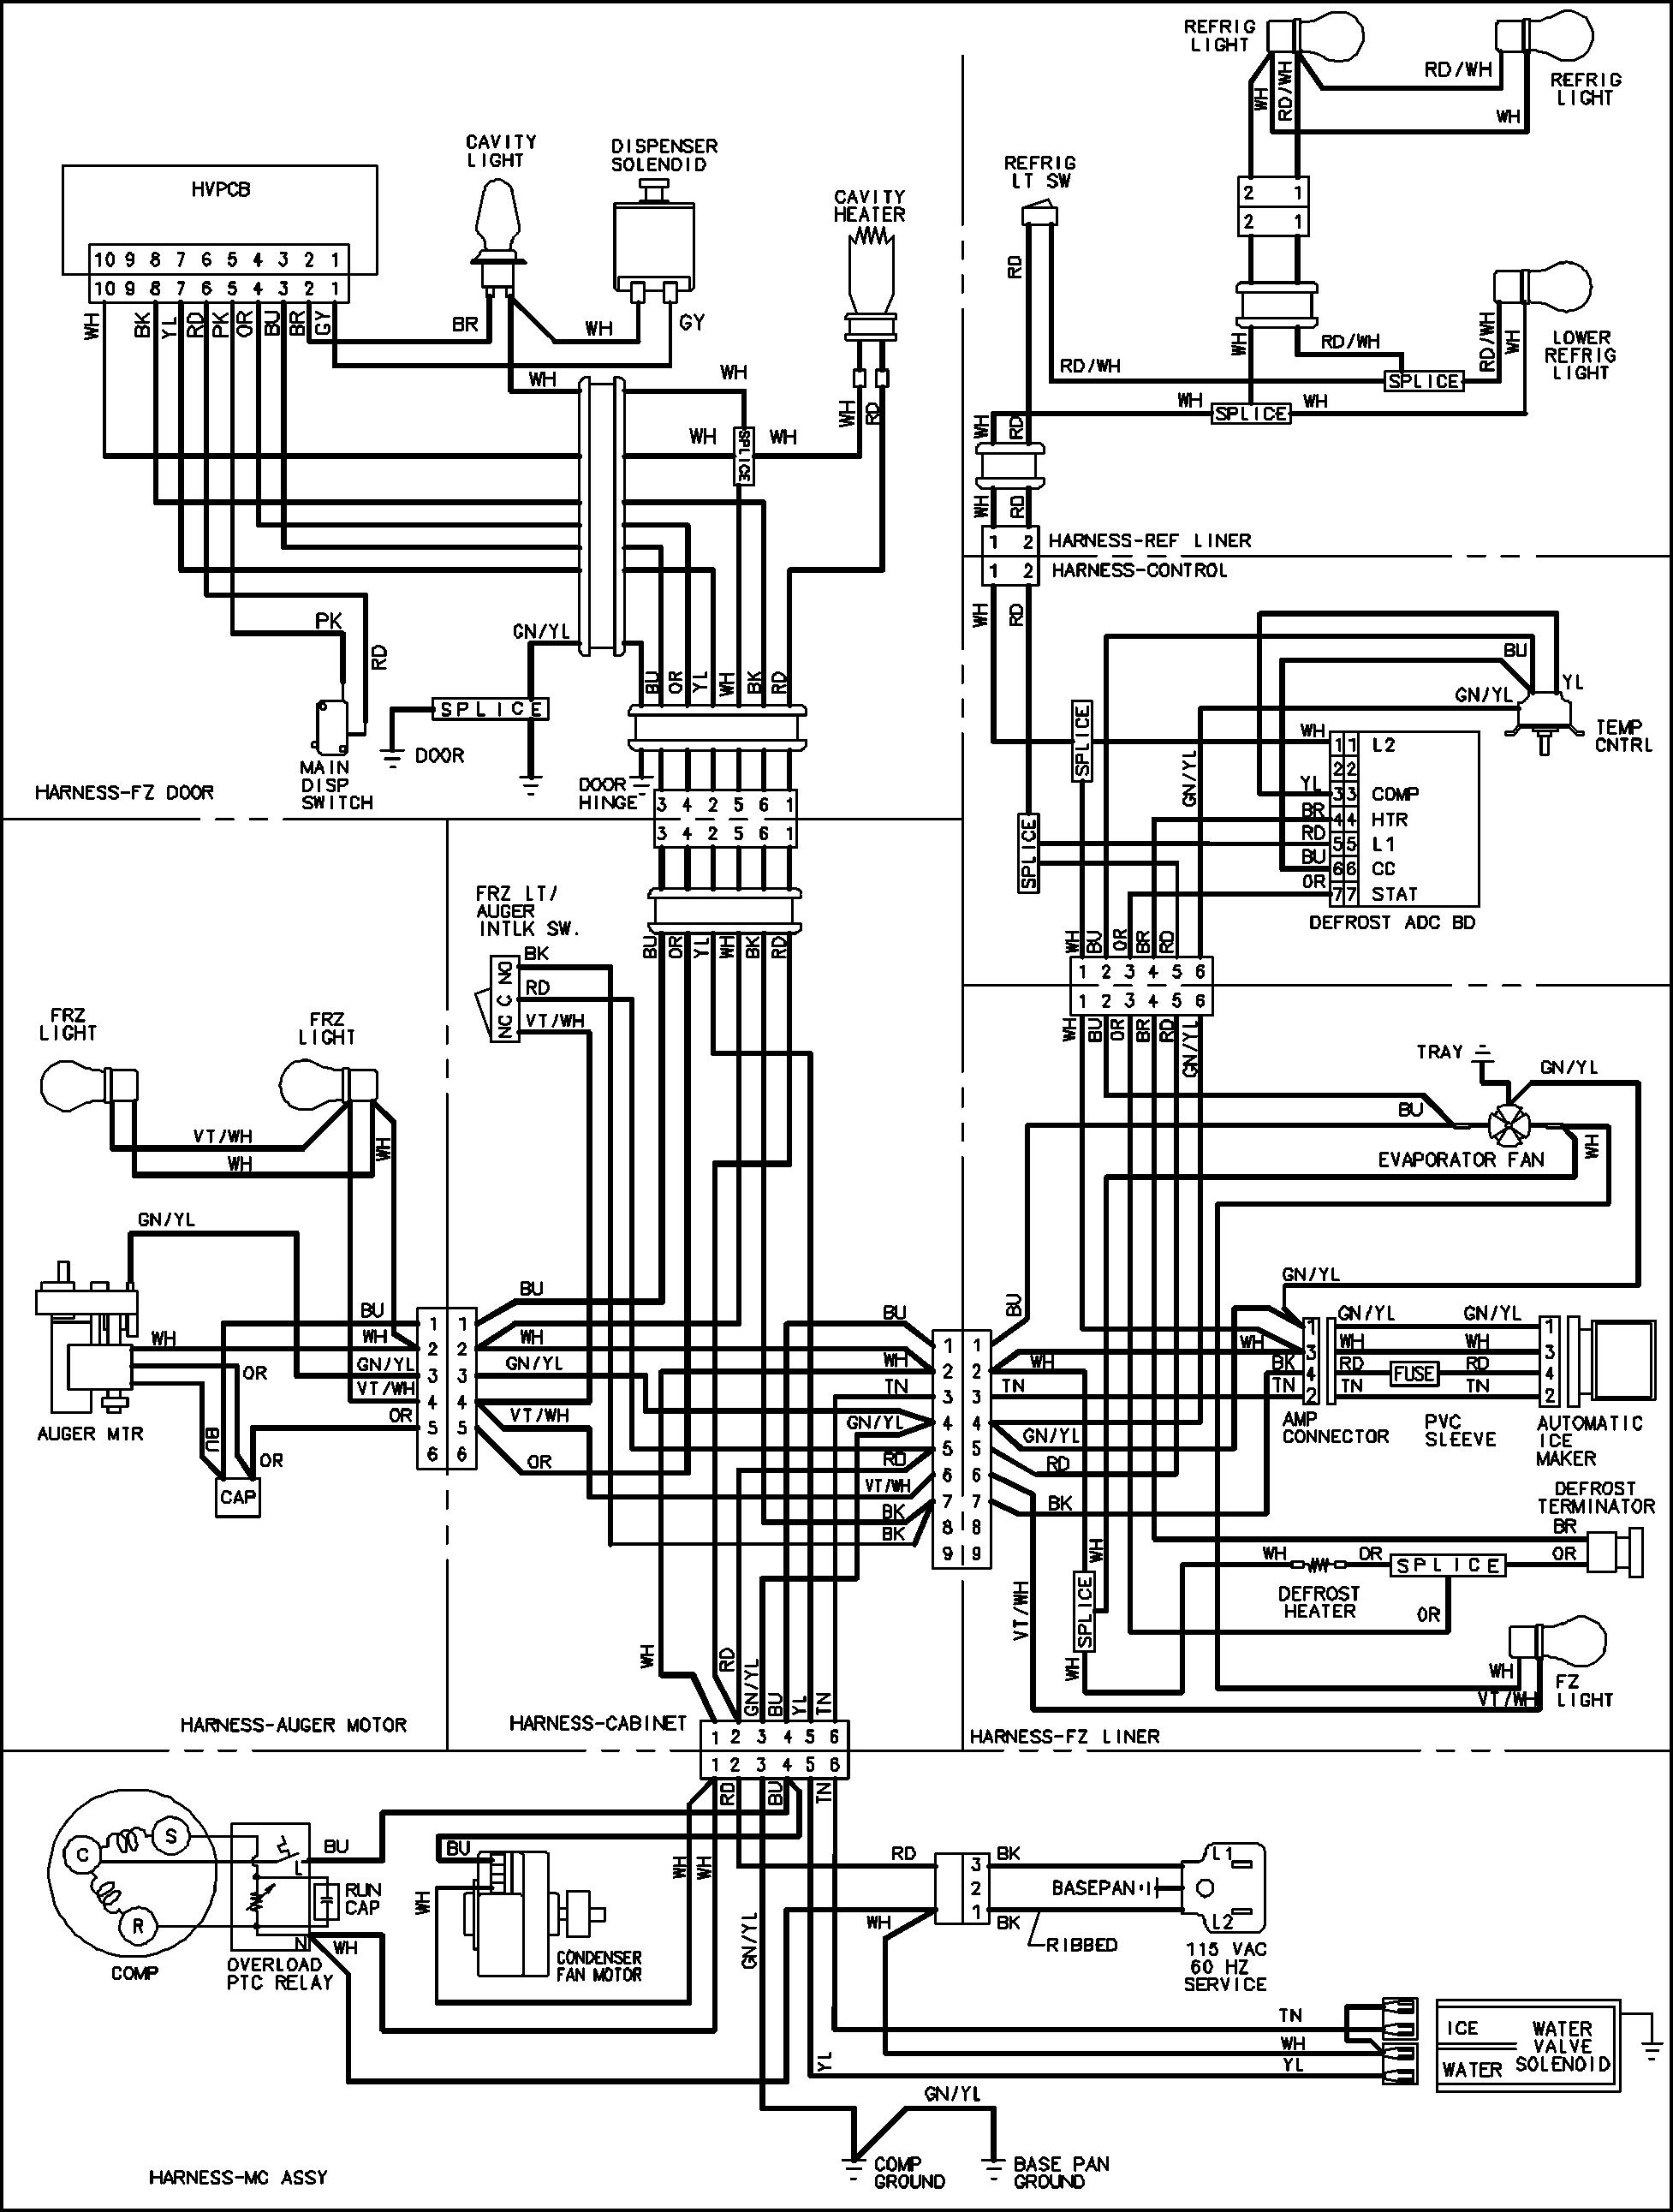 hight resolution of white knight tumble dryer wiring diagram gibson dryer dryer motor wiring diagram frigidaire dryer wiring diagram